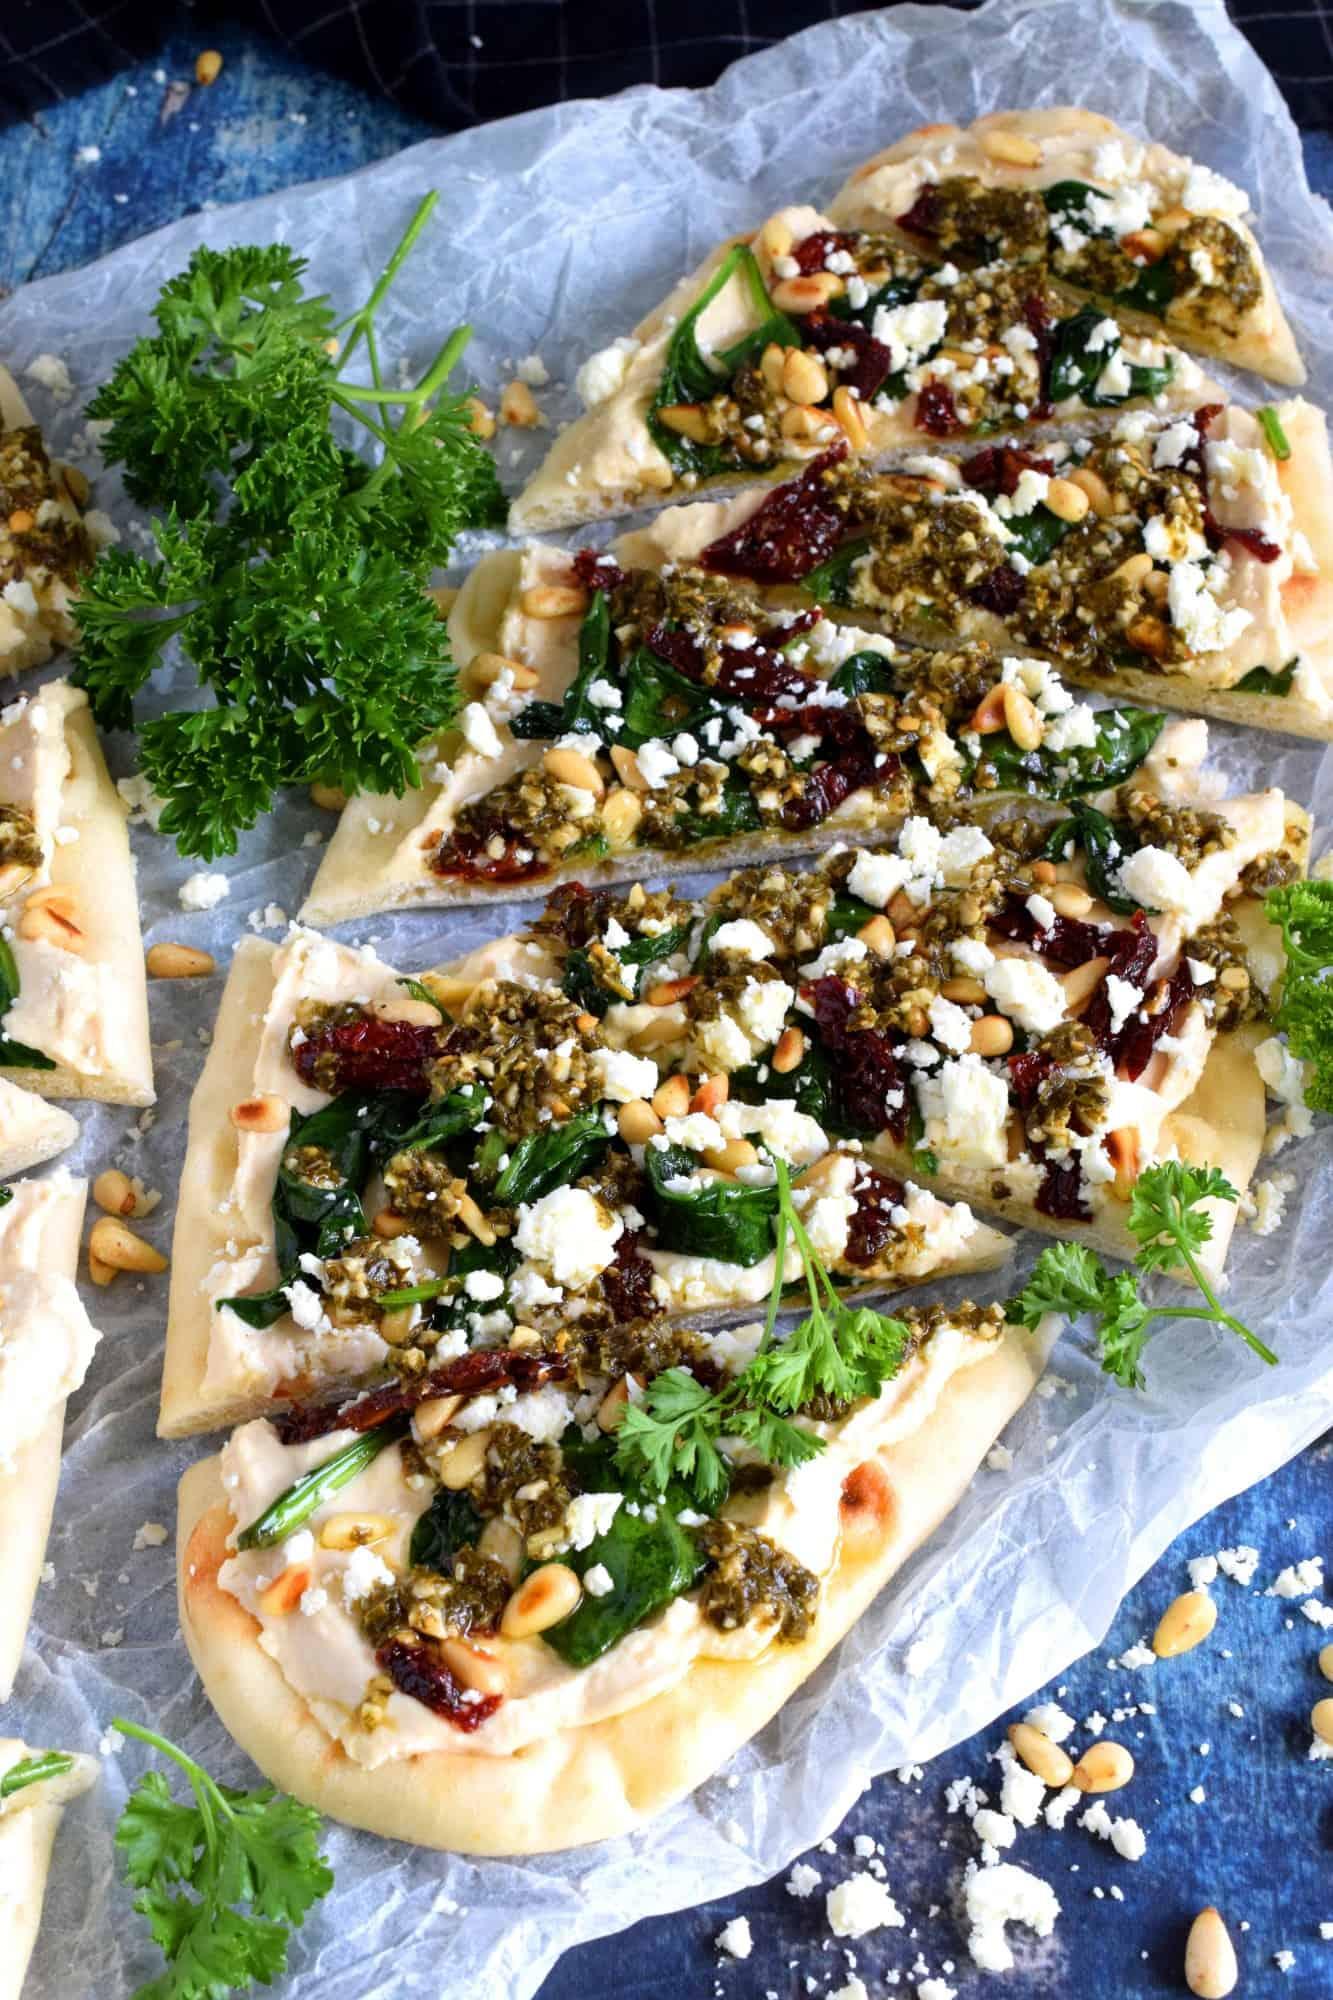 Hummus And Pesto Flatbread Appetizer